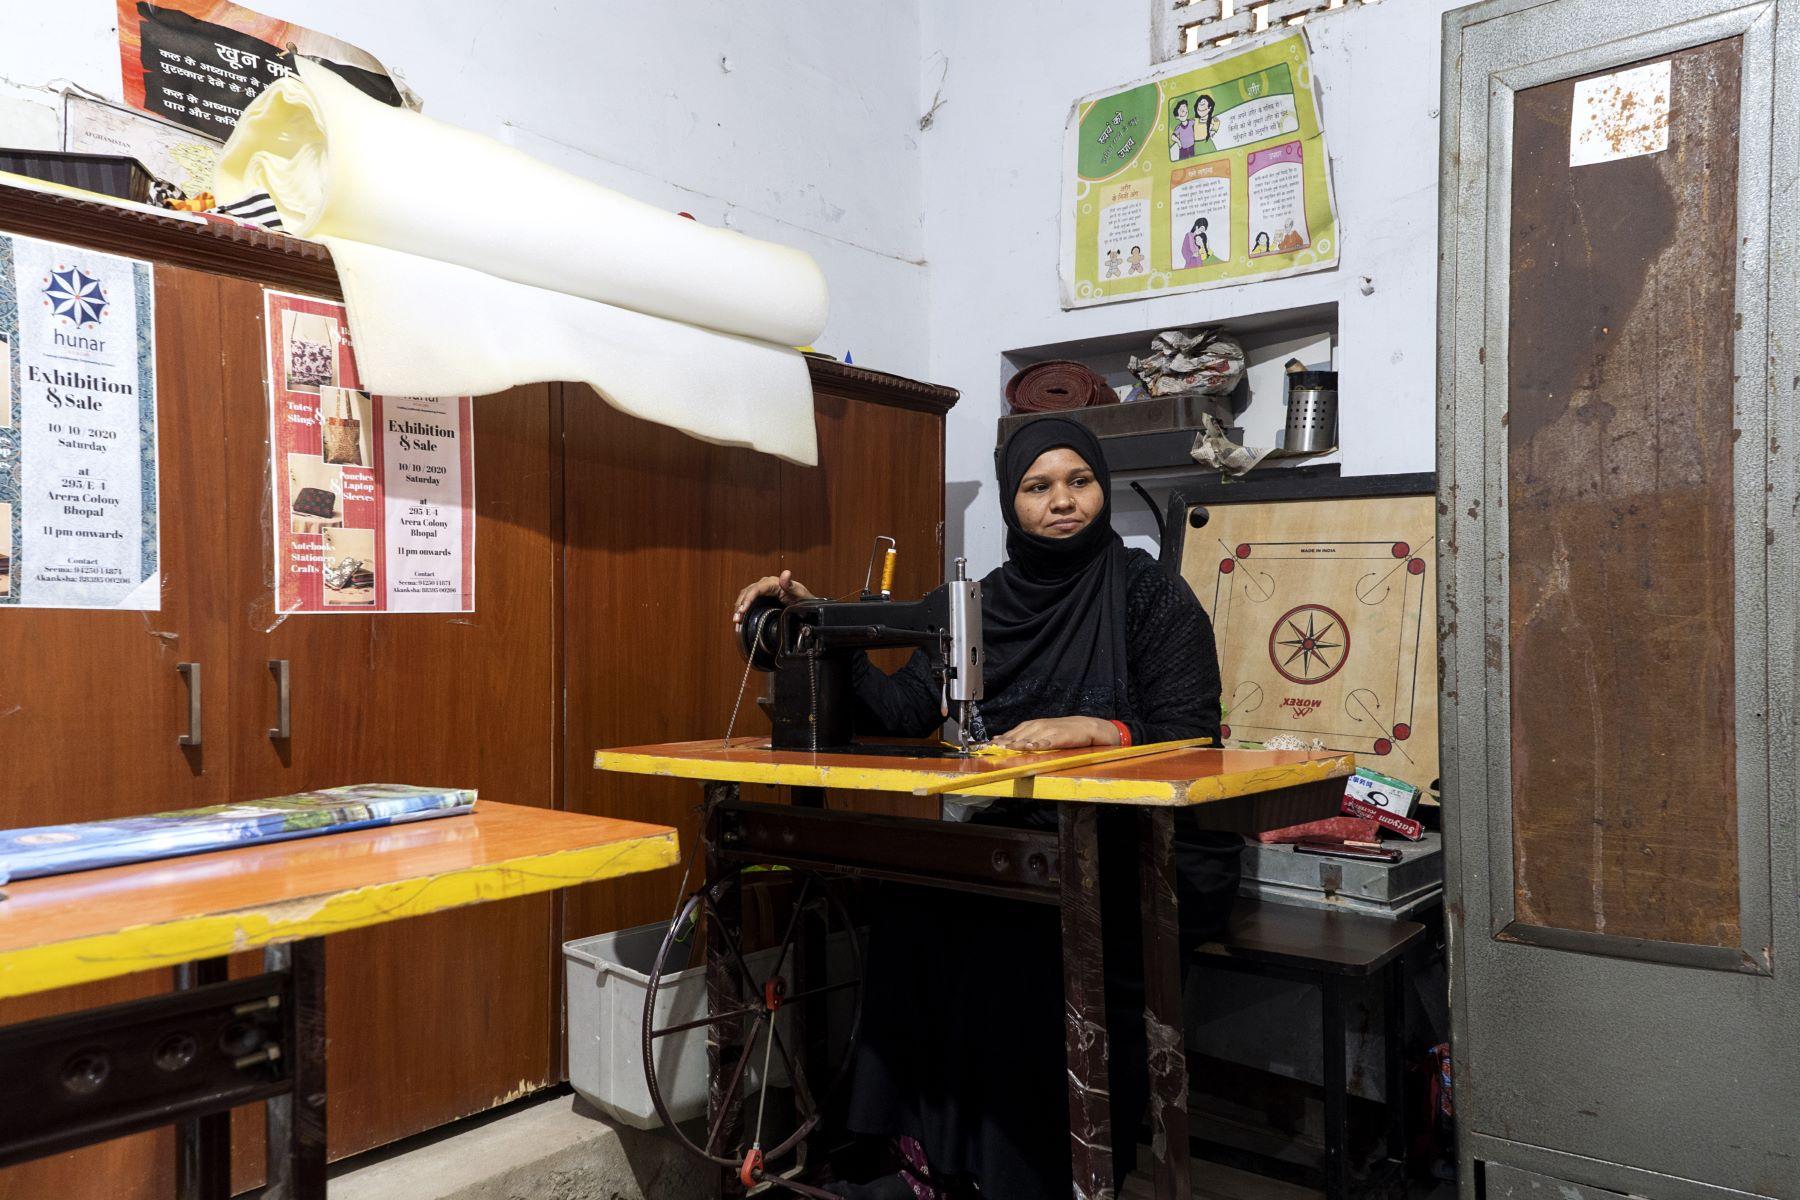 Shabnam ji manages Hunar and conducts stitching classes at Eka